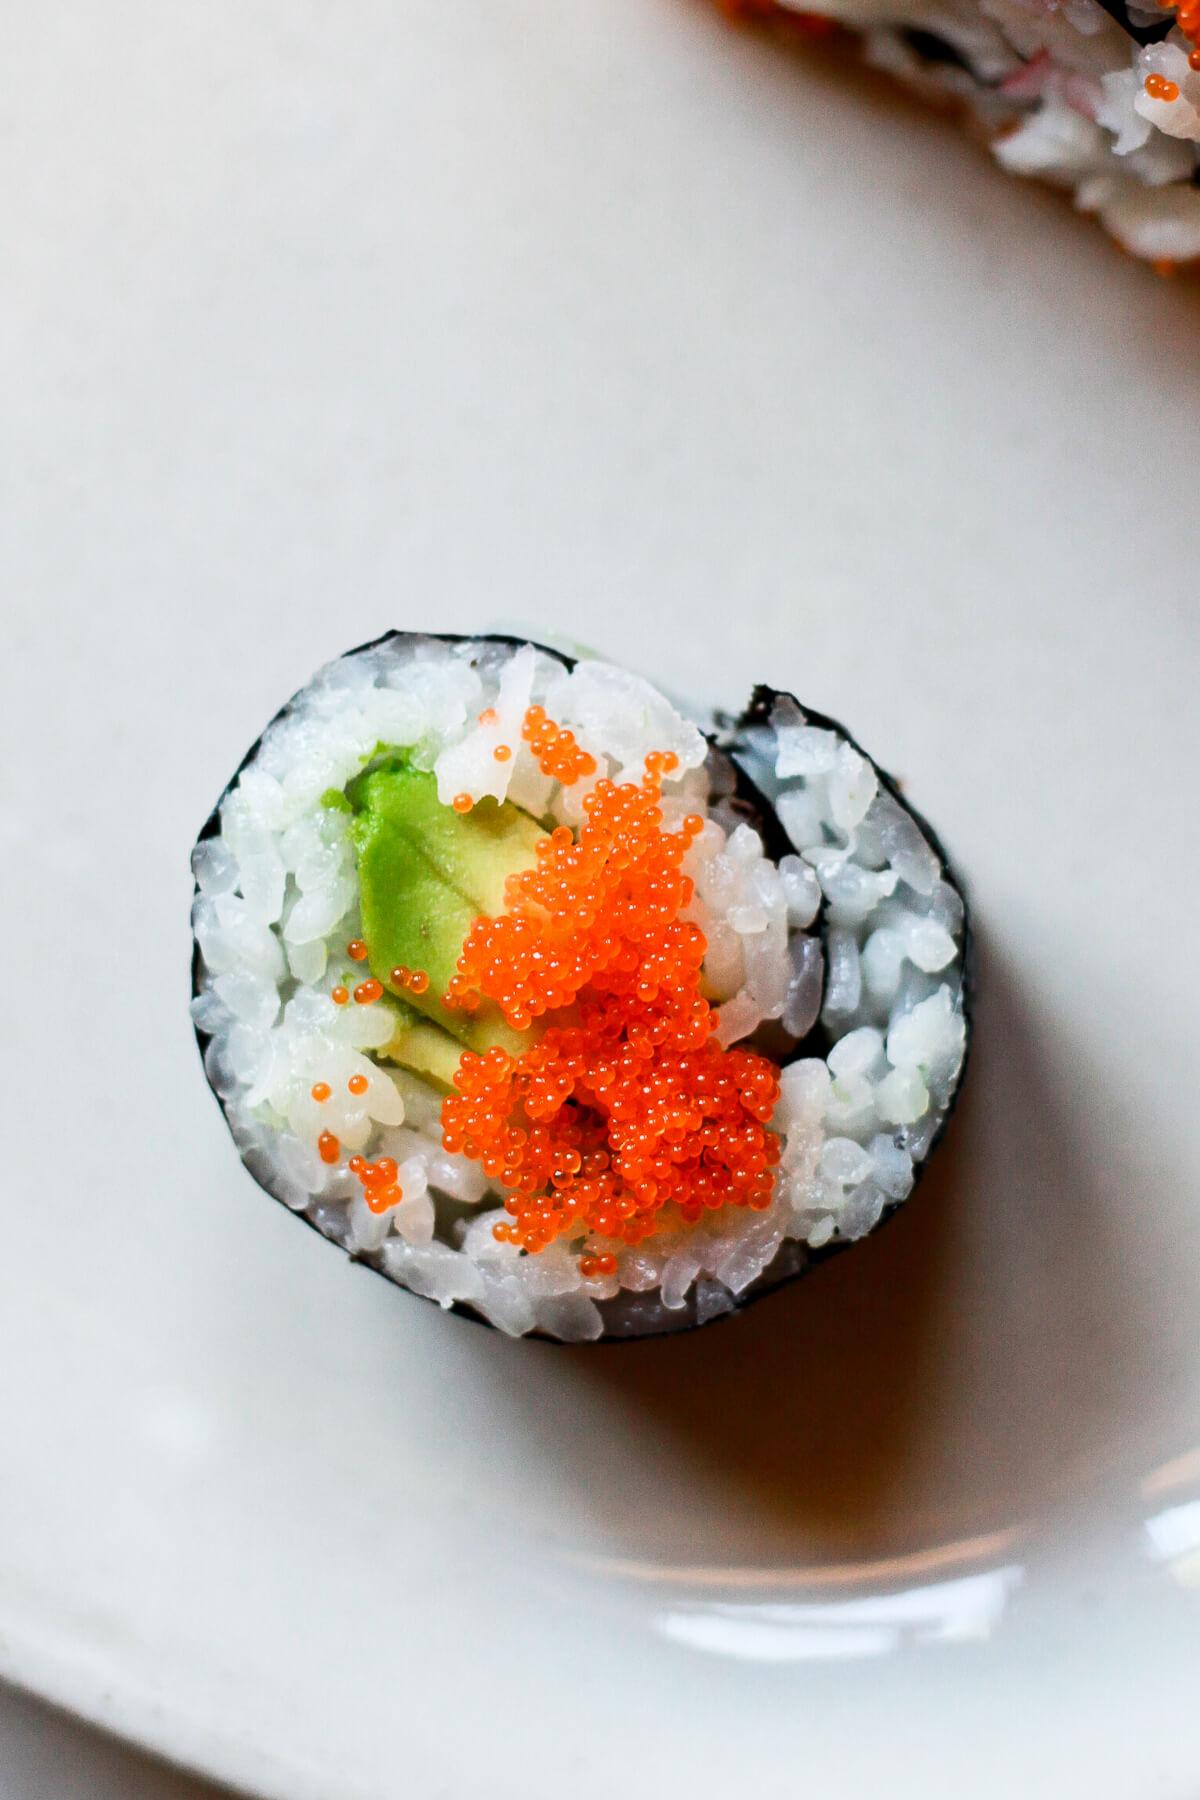 An overhead photo of a piece of avocado sushi with masago.